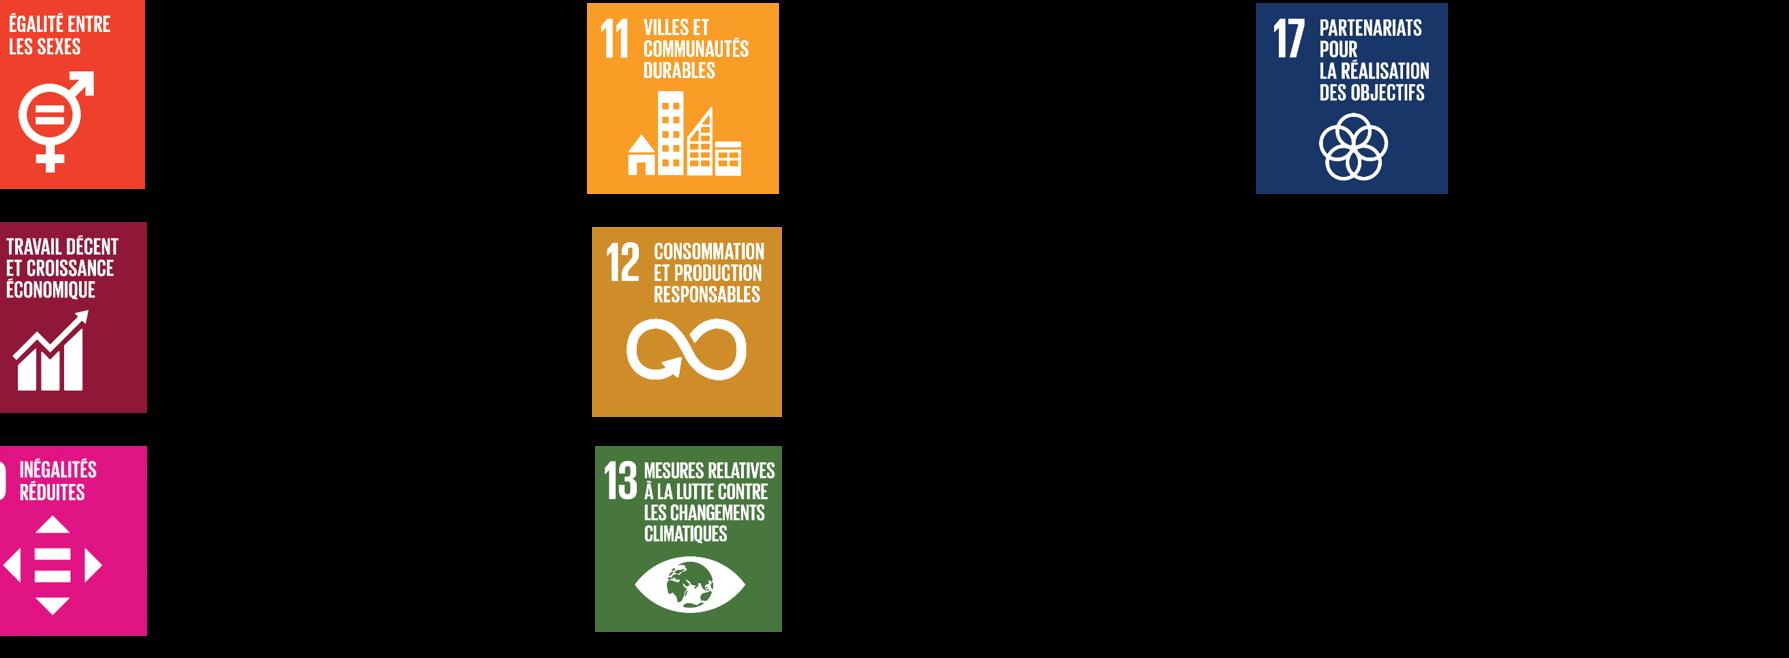 objectifs_developpement_durable_TERTIO